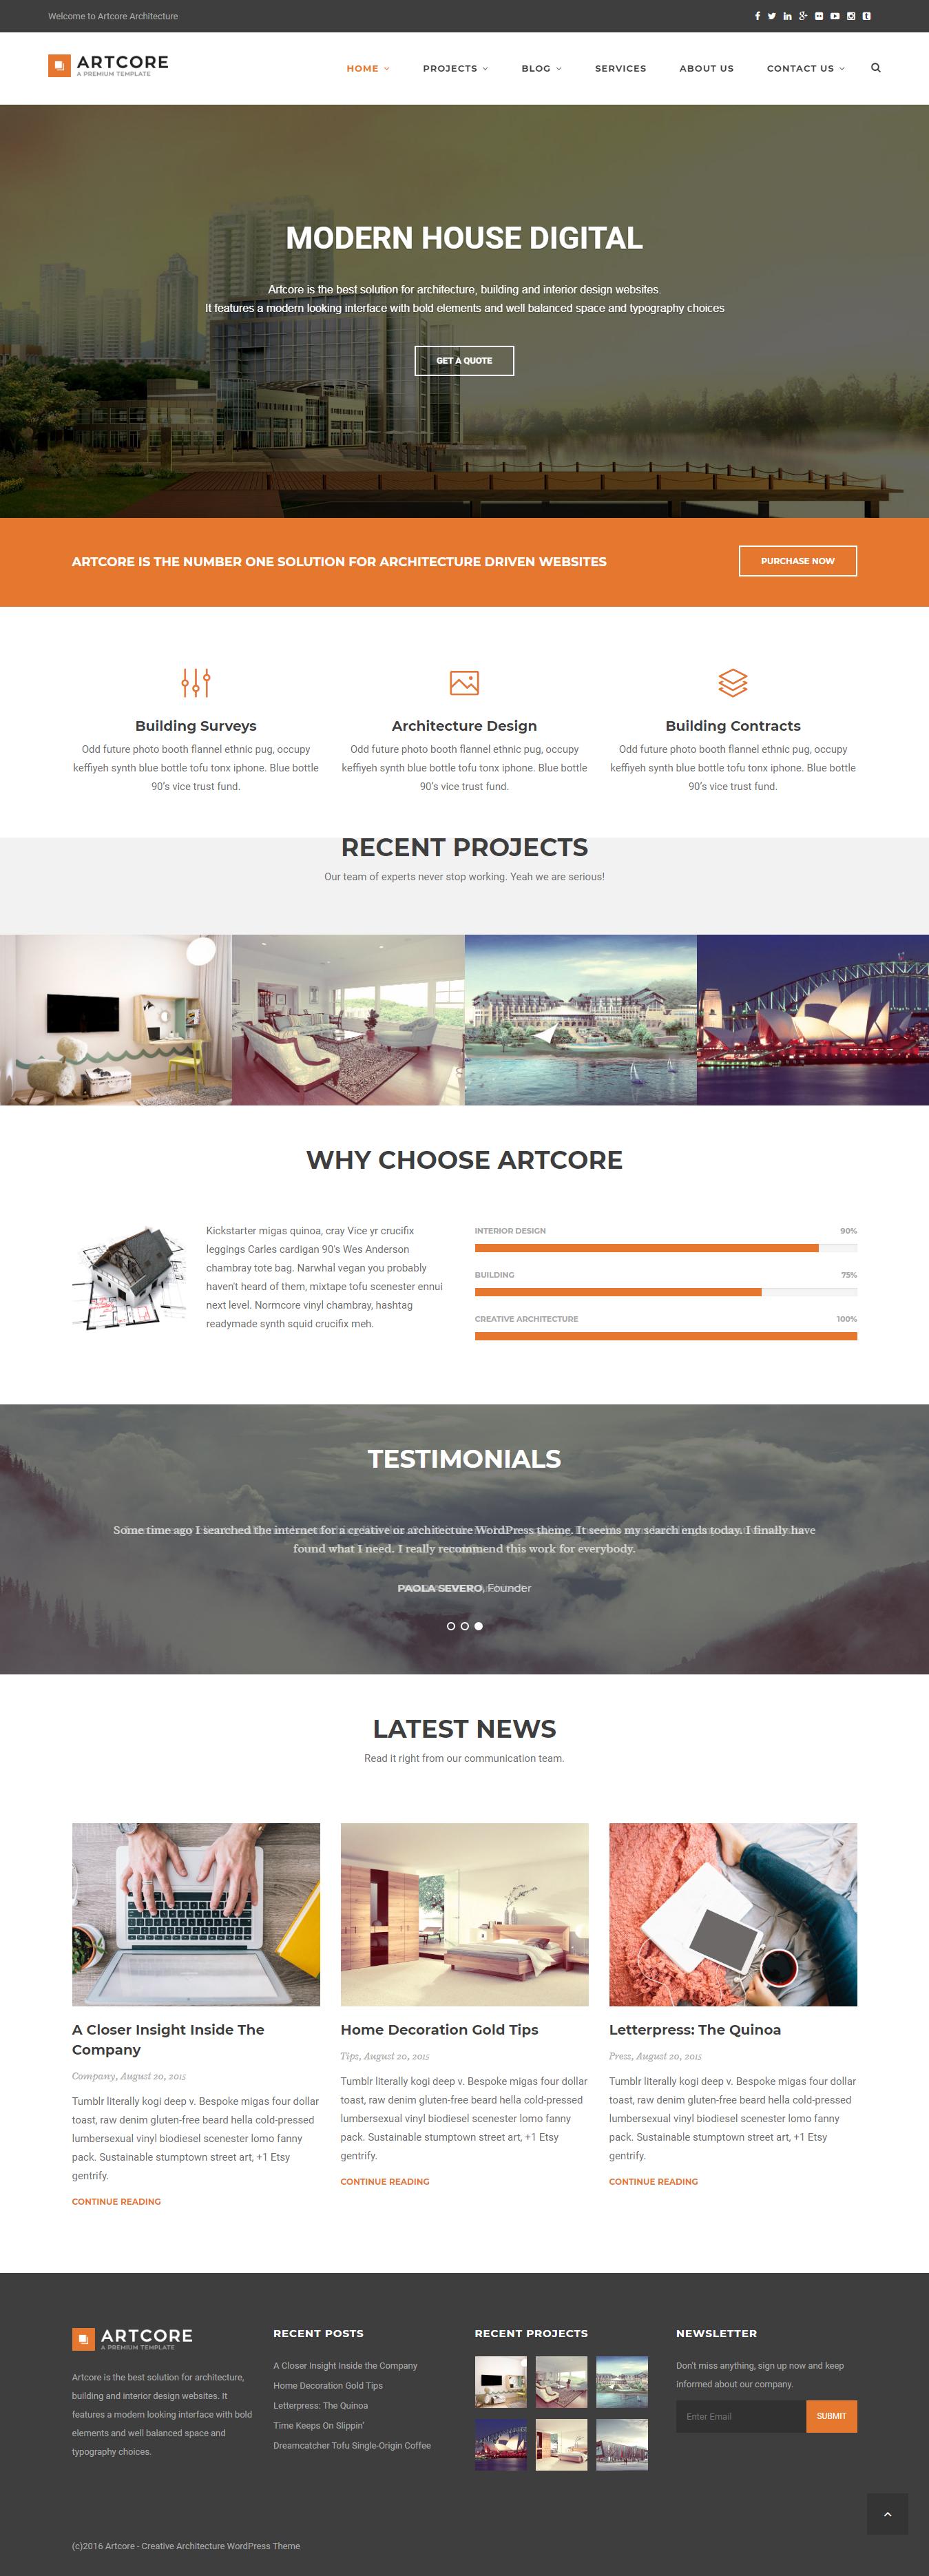 artcore best premium architecture wordpress theme - 10+ Best Premium Architecture WordPress Themes